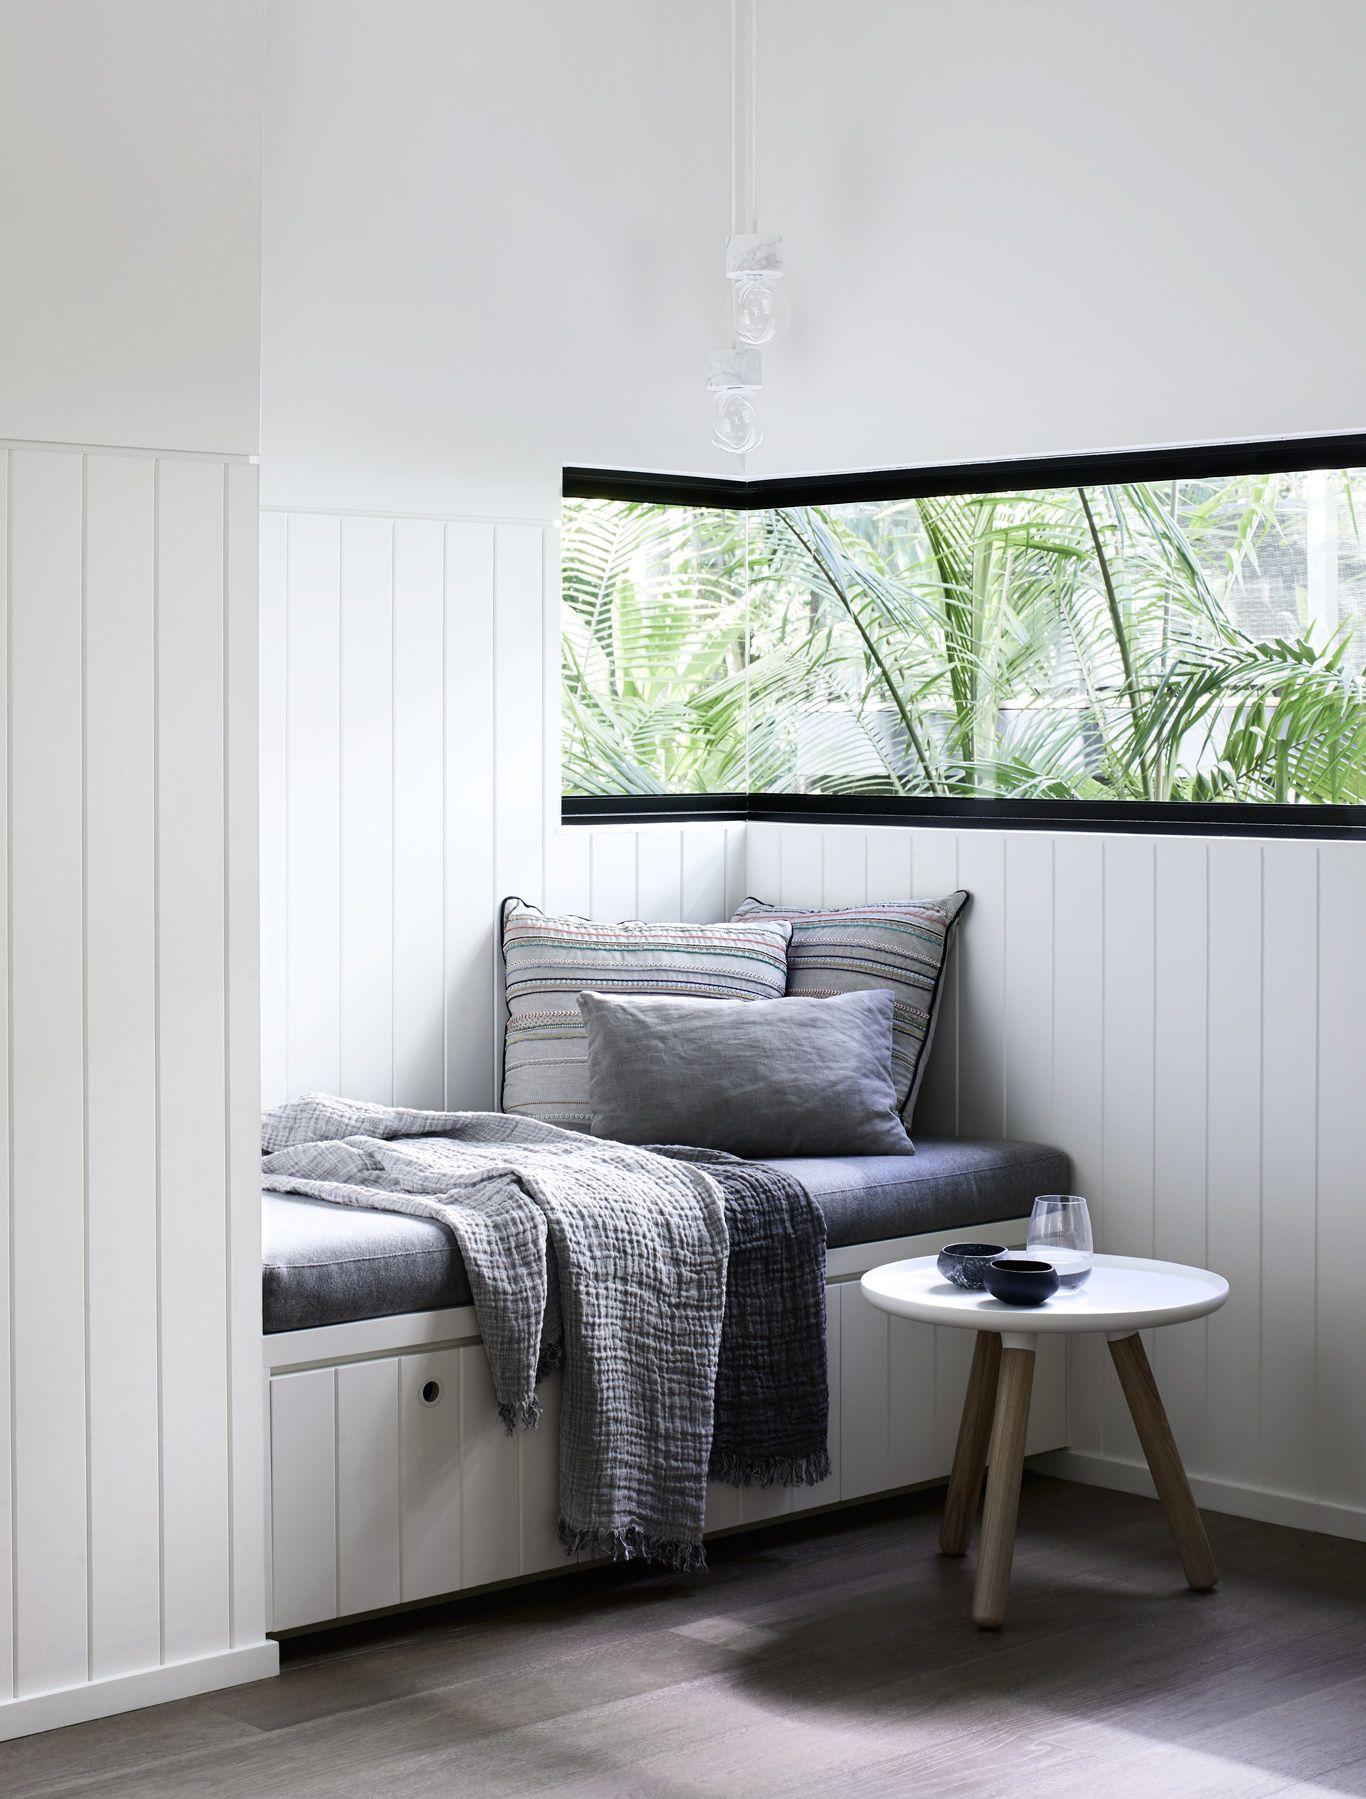 Rlc residence edge of rainforest is an external and internal